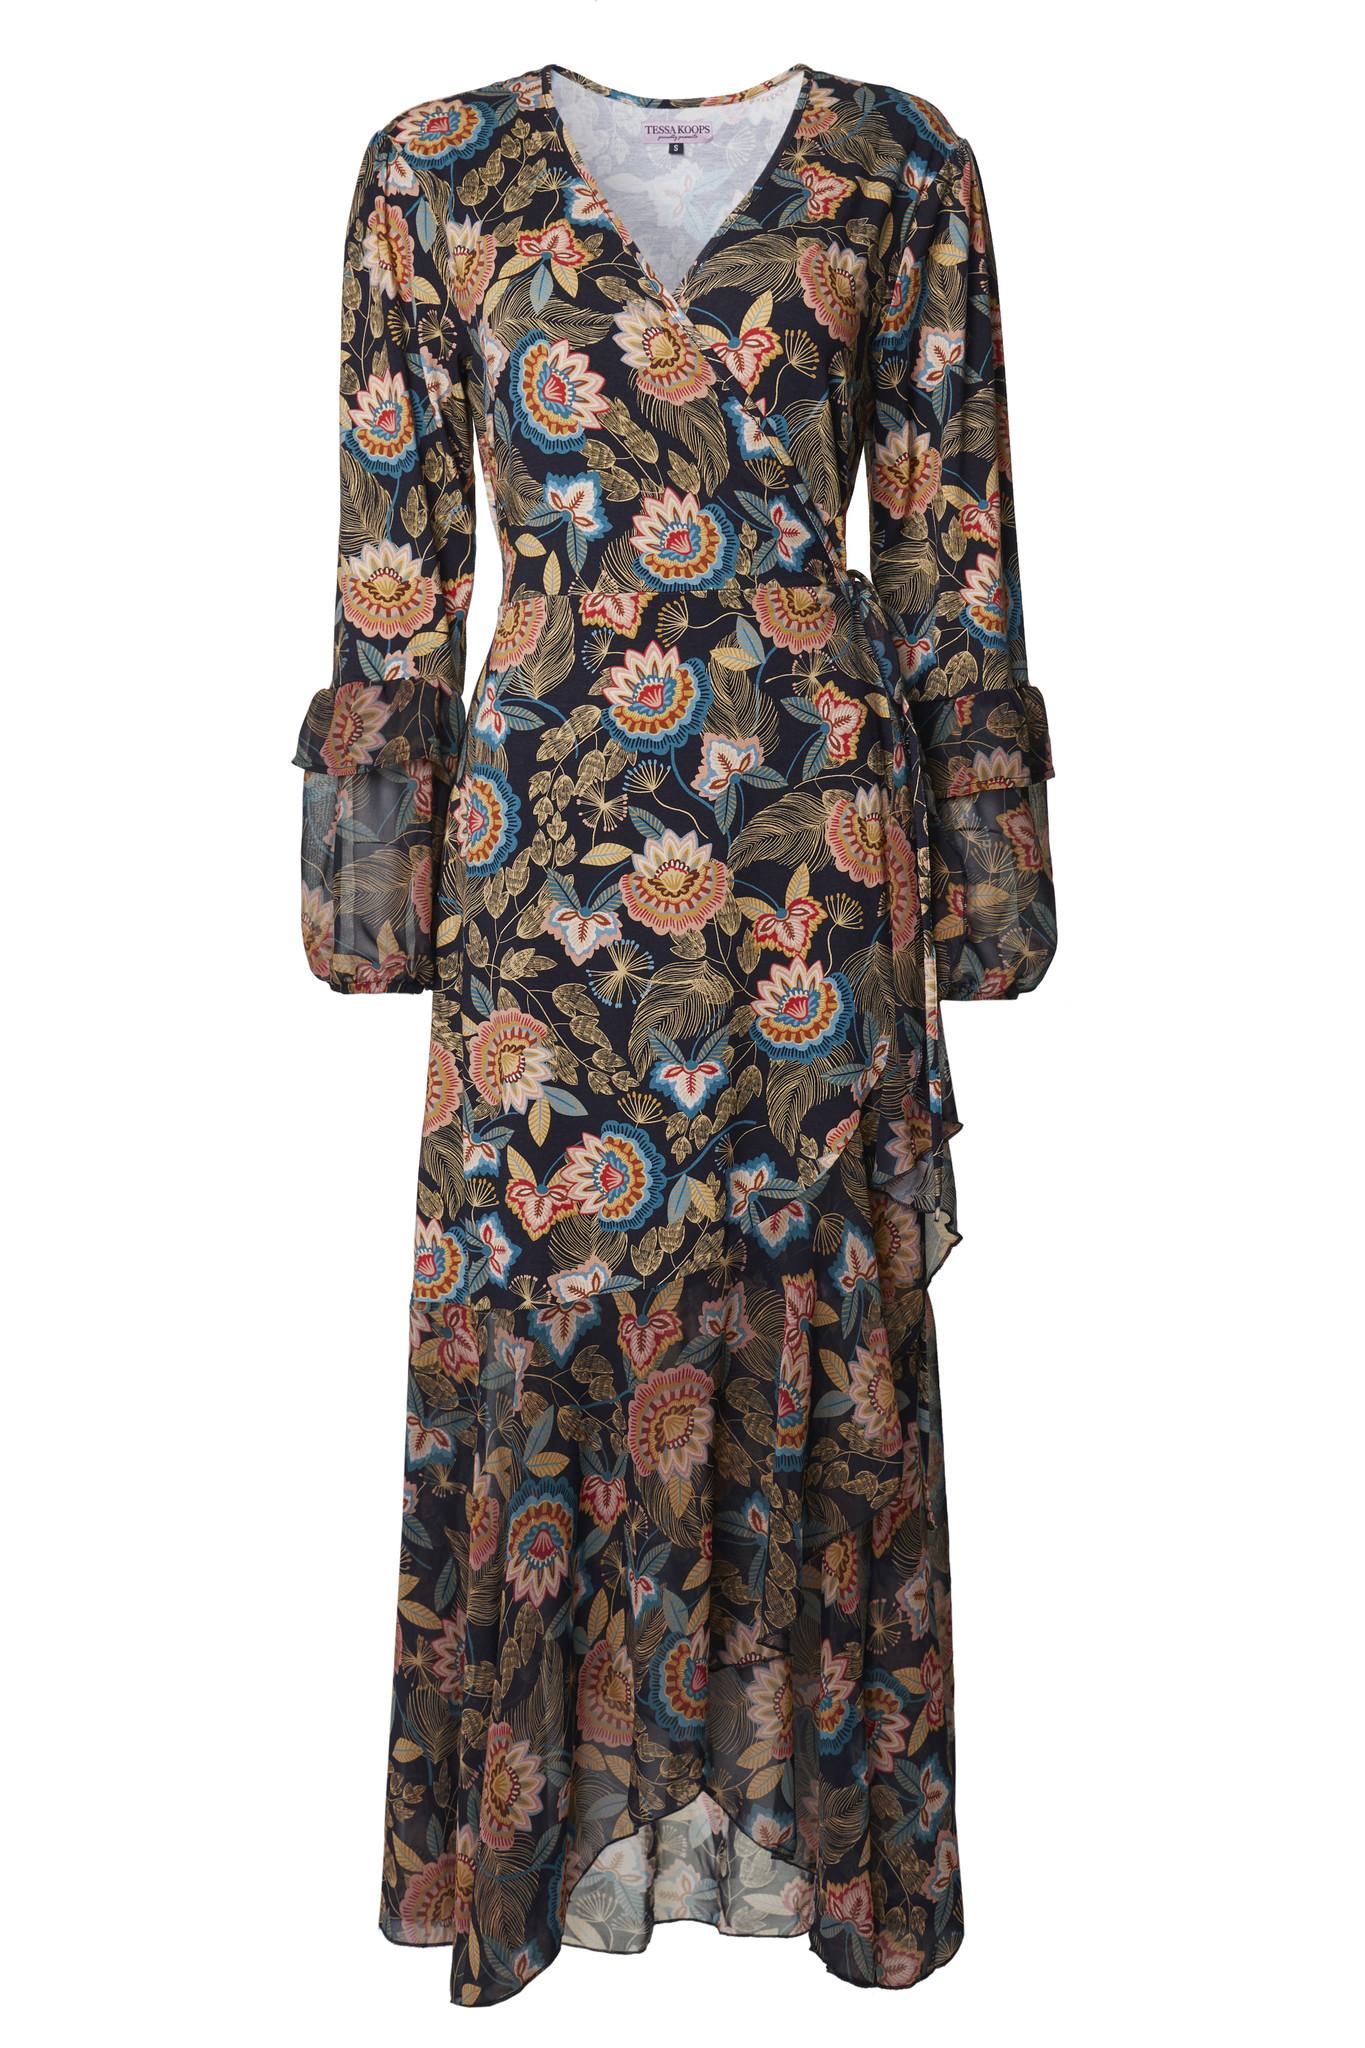 TESSA KOOPS LINDIANA BOHO DRESS